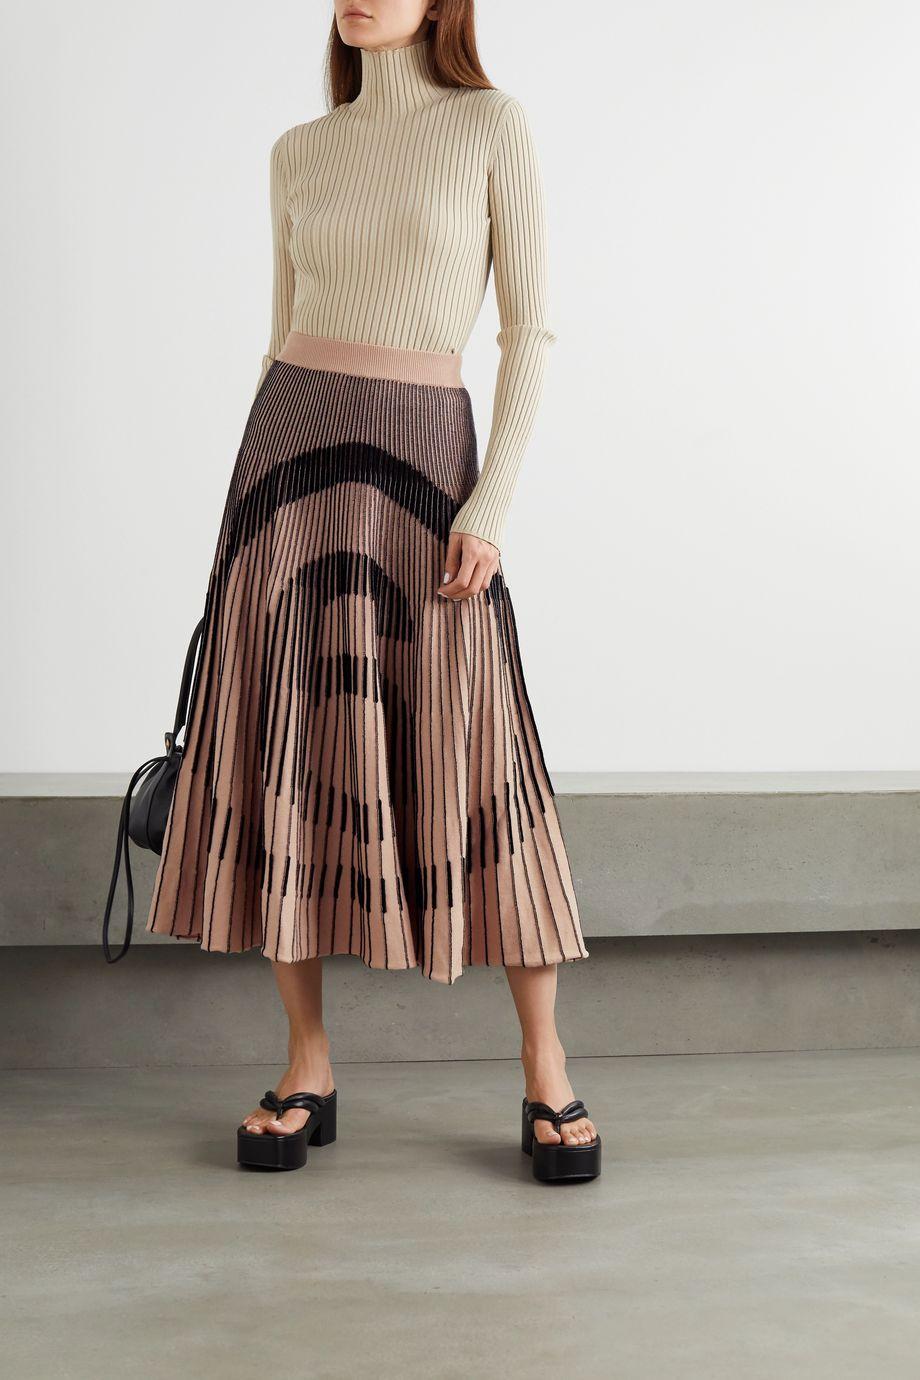 MM6 Maison Margiela 罗纹嵌花棉质混纺中长半身裙